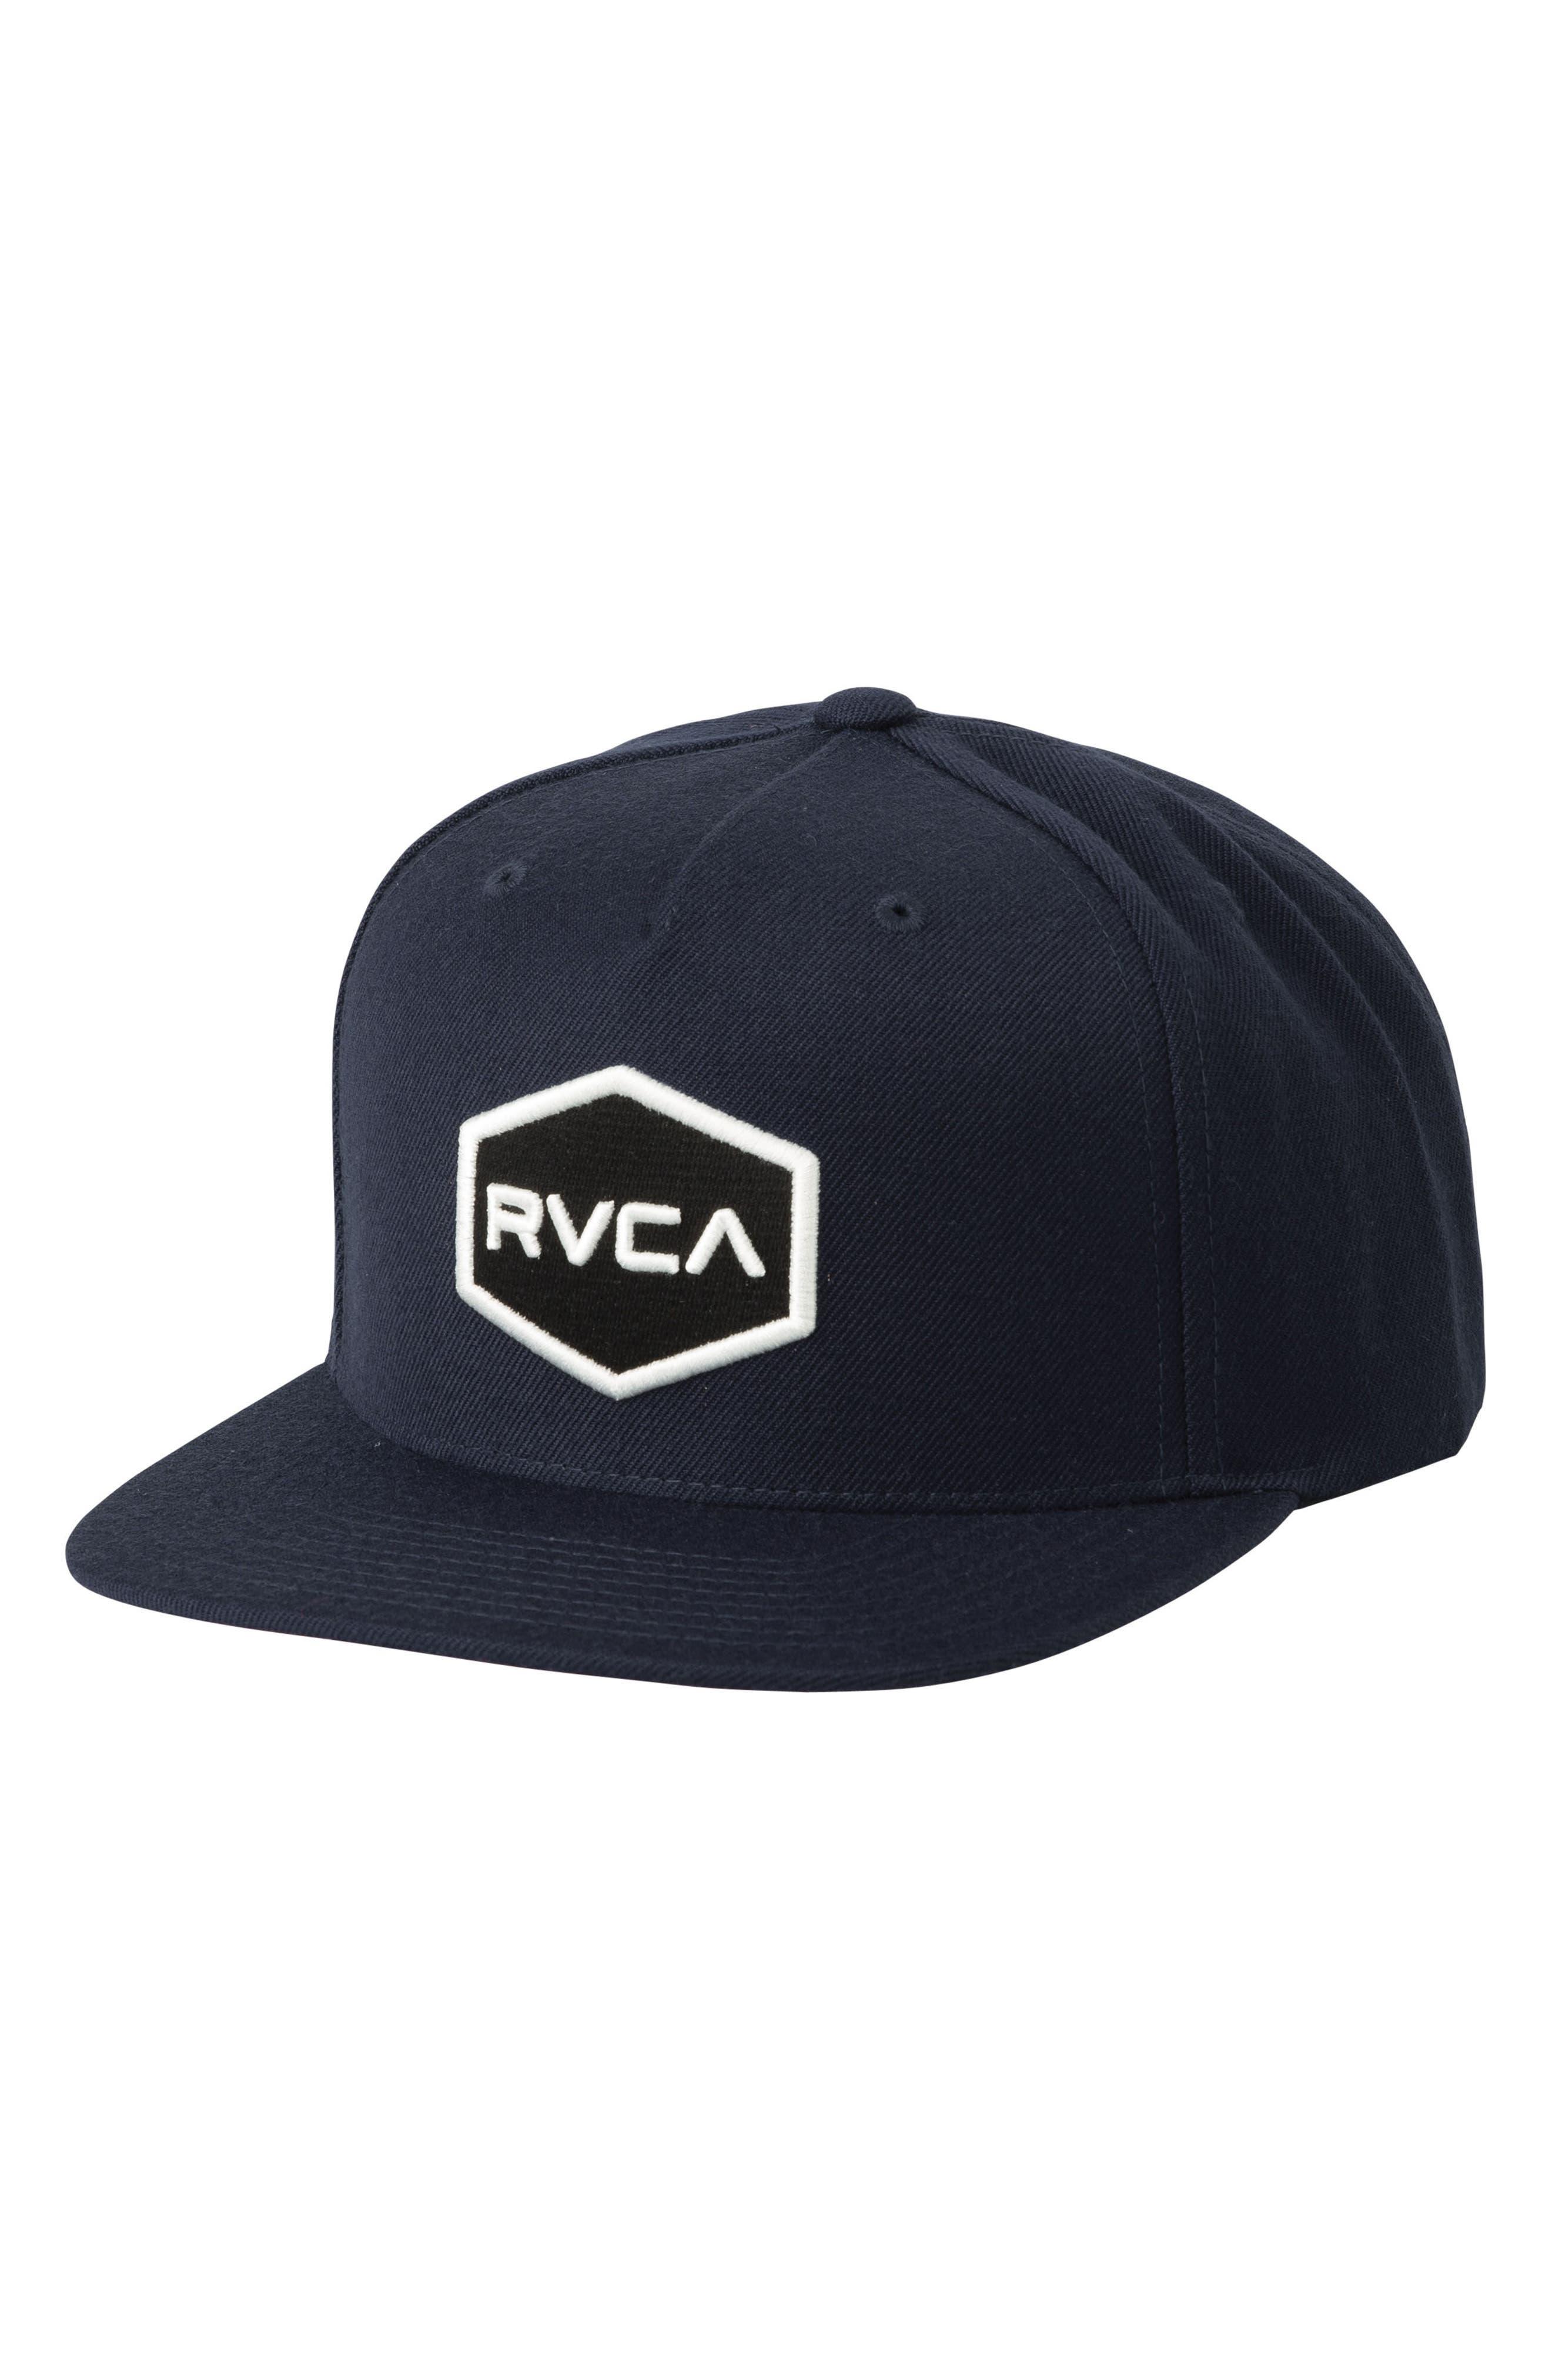 Commonwealth Snapback Baseball Cap,                             Main thumbnail 1, color,                             Black/ White